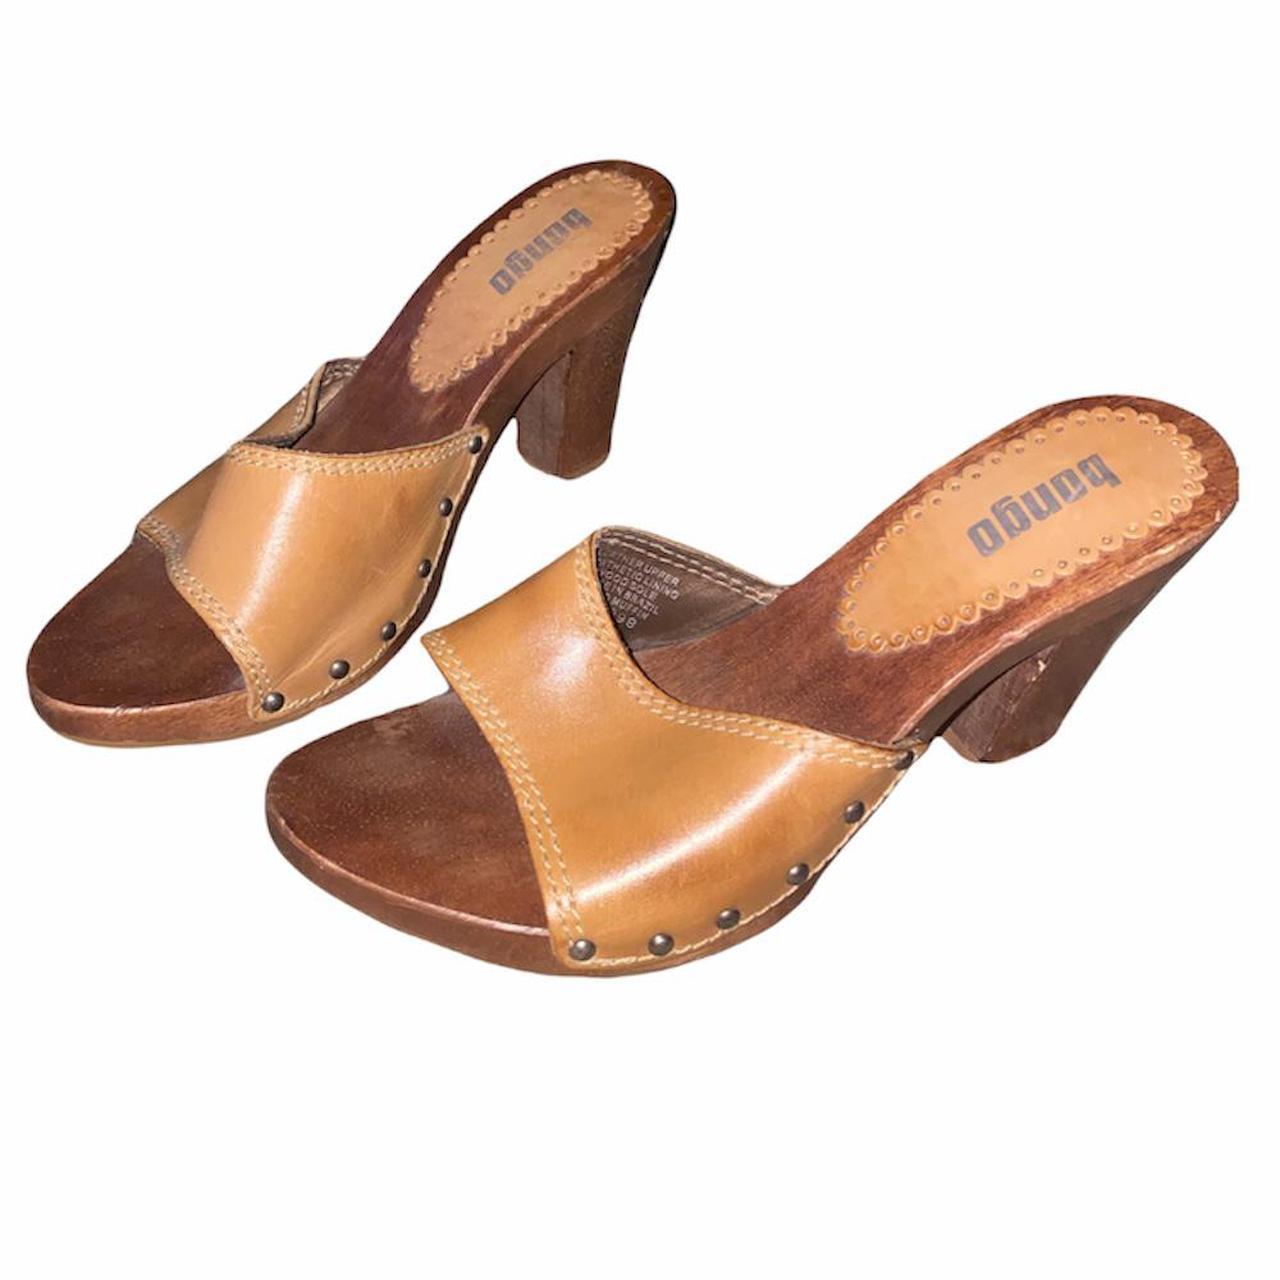 Product Image 1 - Vintage y2k studded wooden heeled